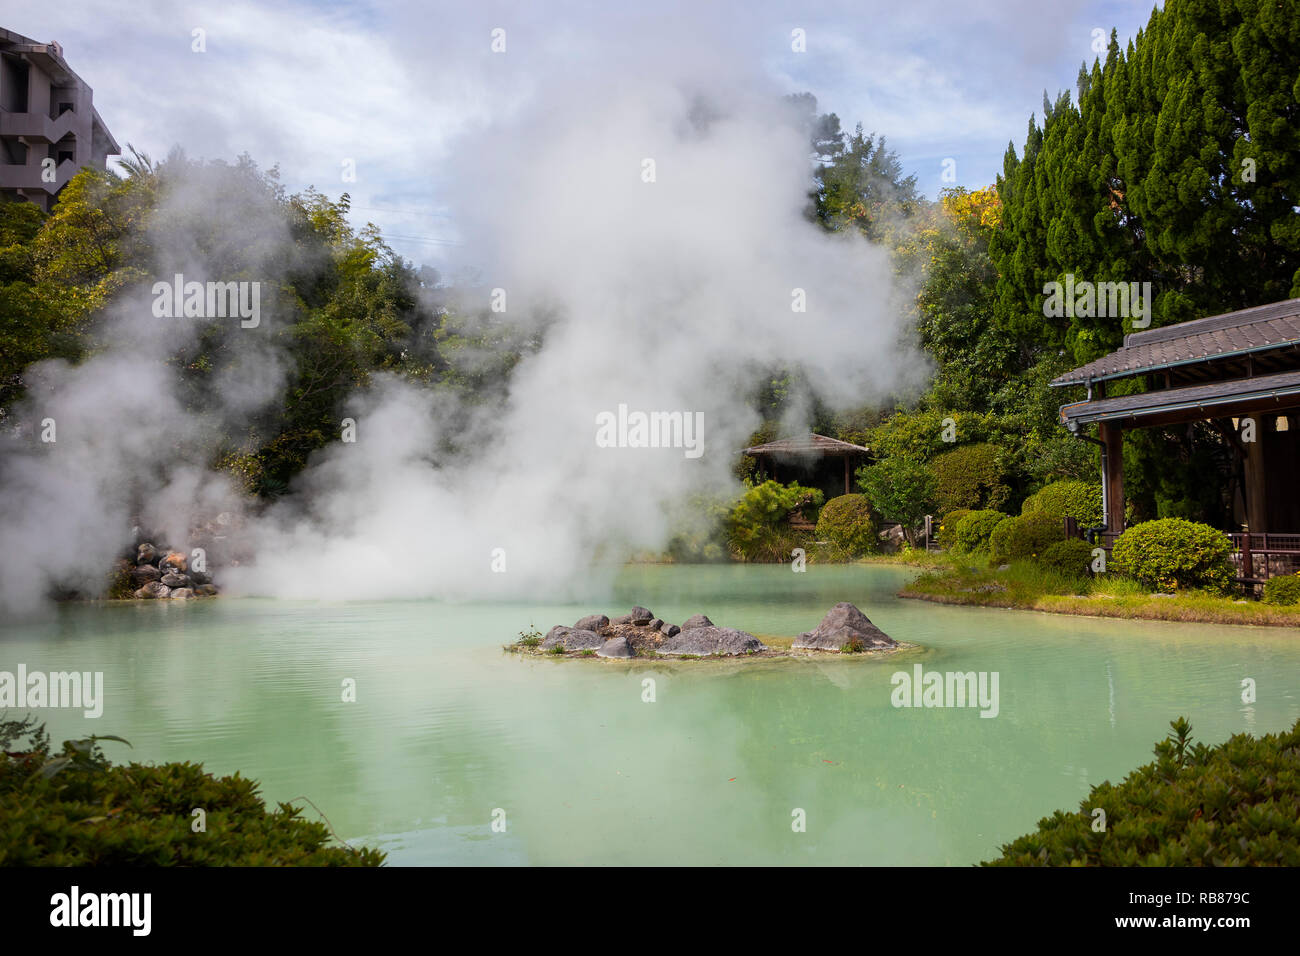 Beppu, Japan - 2 November, 2018: Tatsumaki Jigoku, geothermischen Pool, auf dem die Hölle tour in Beppu Stockbild